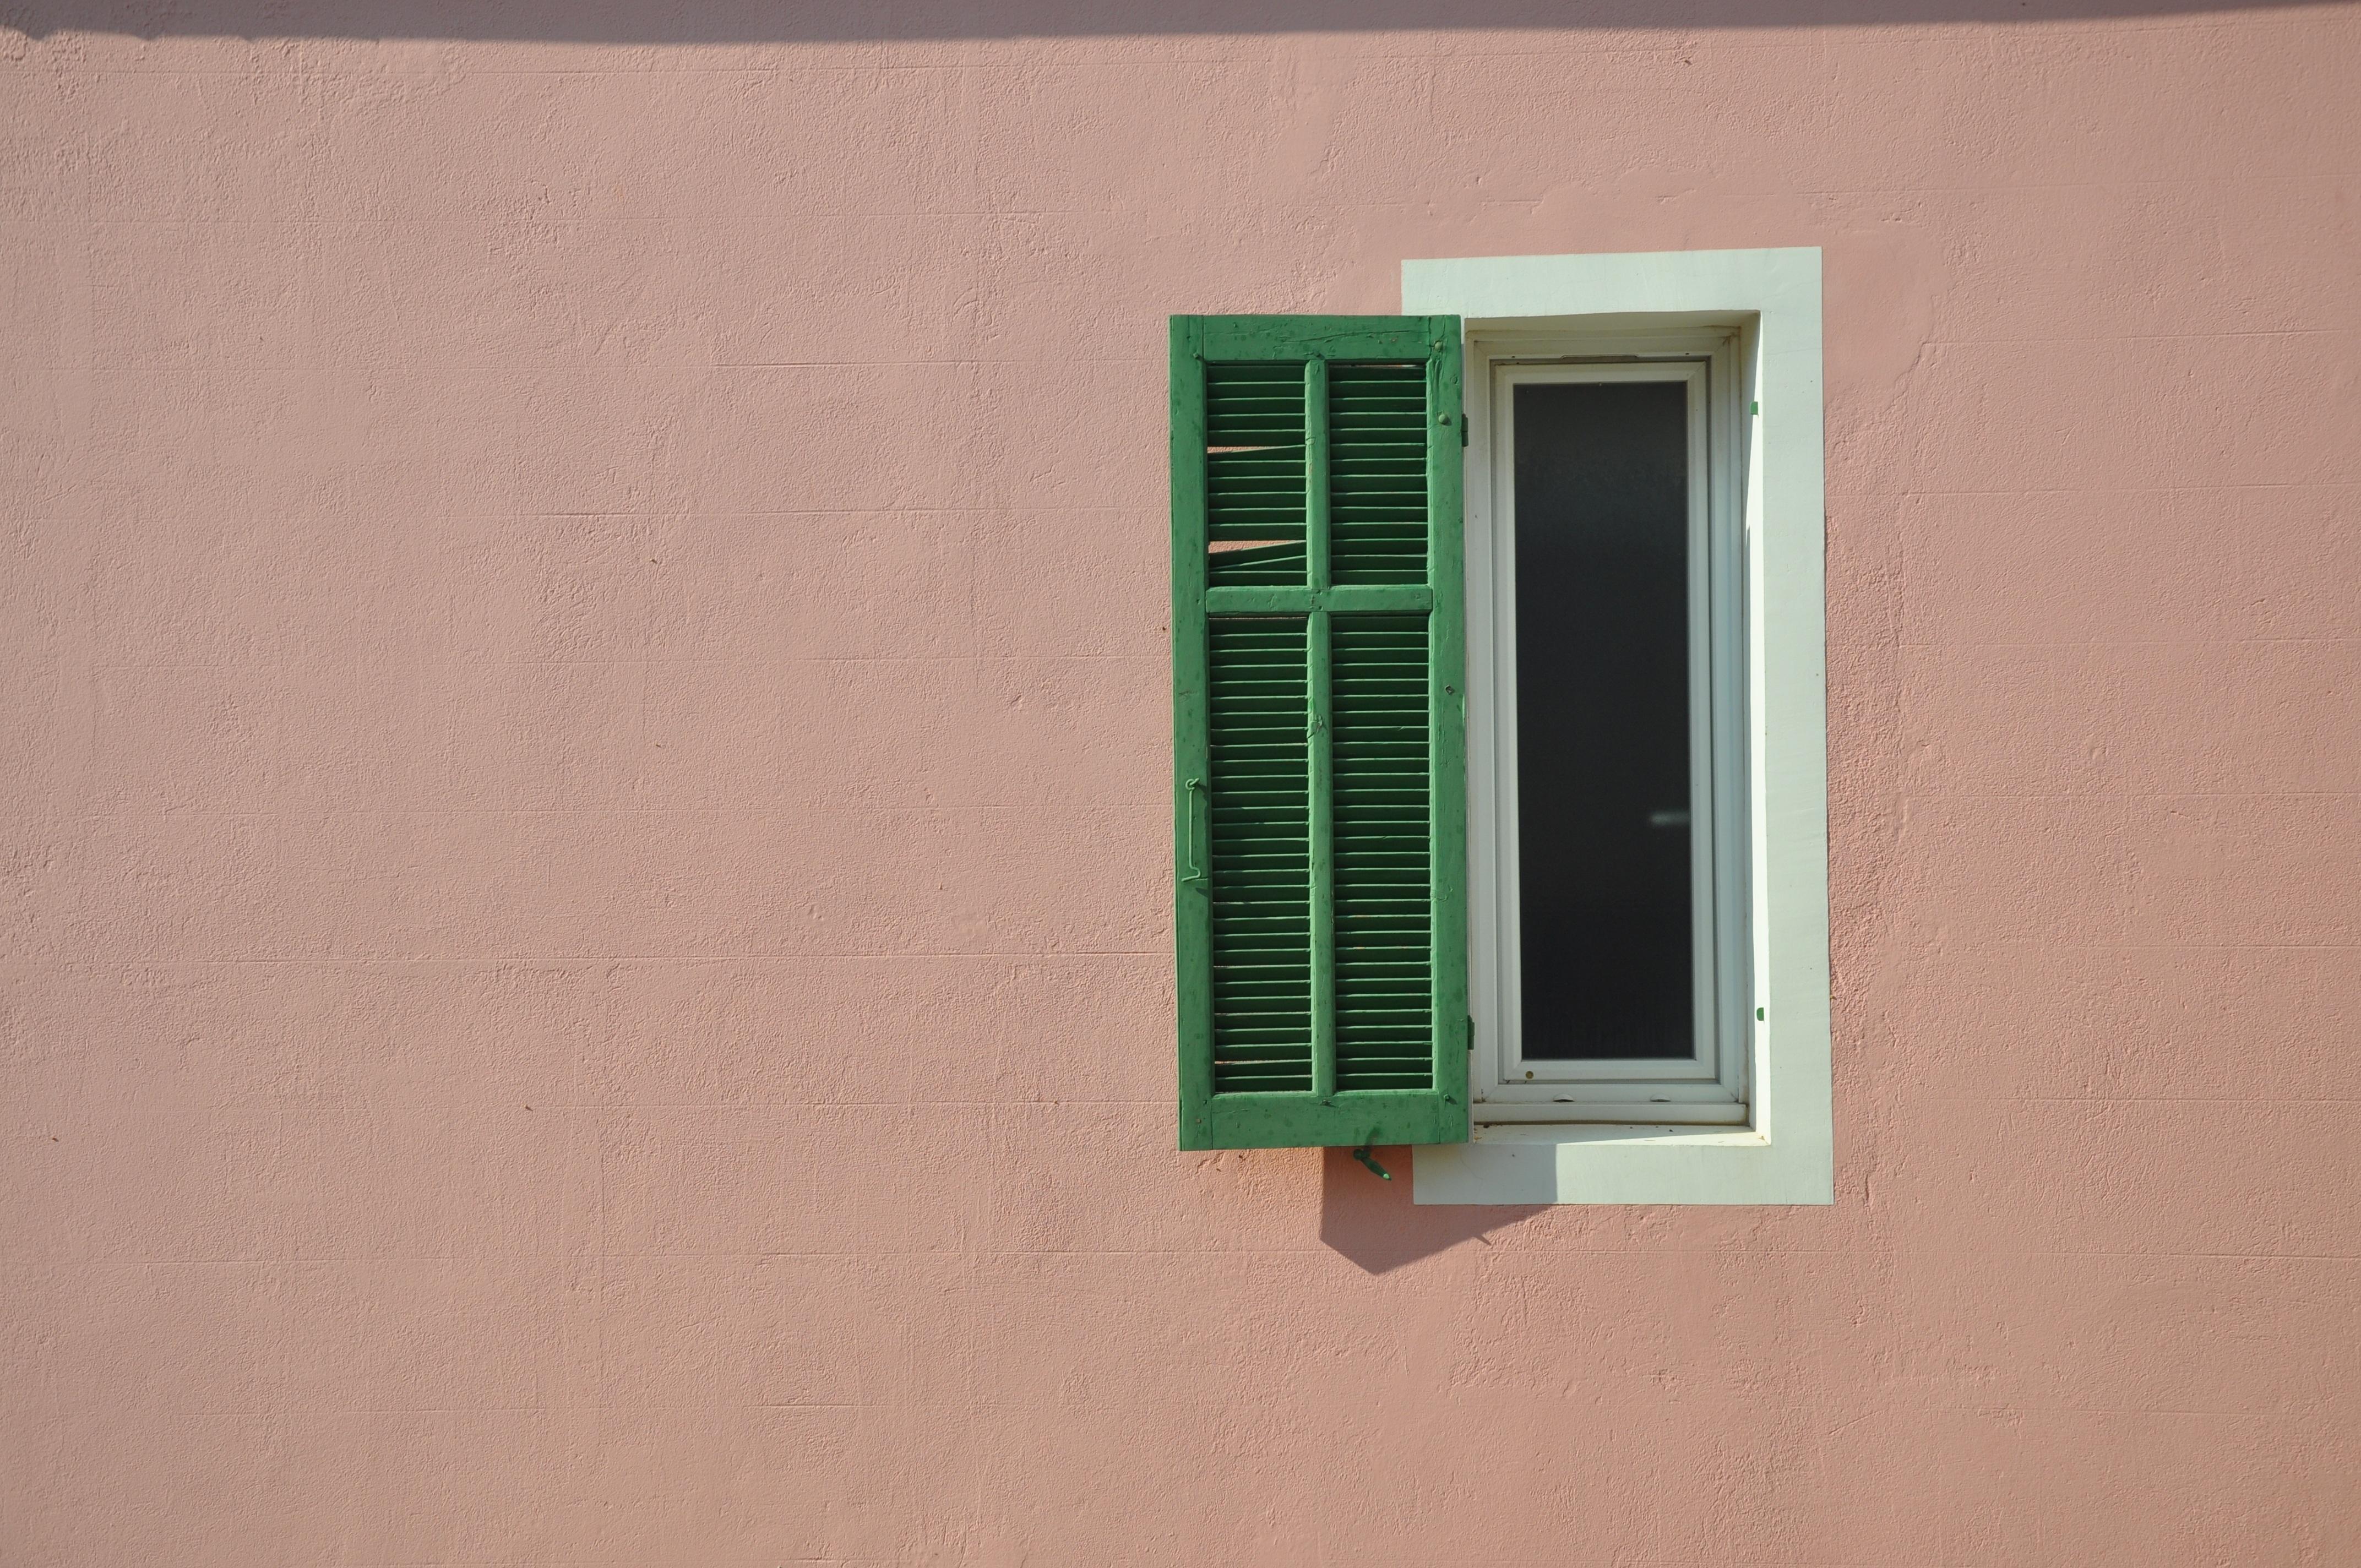 get.pxhere.com/photo/wood-white-house-window-build...